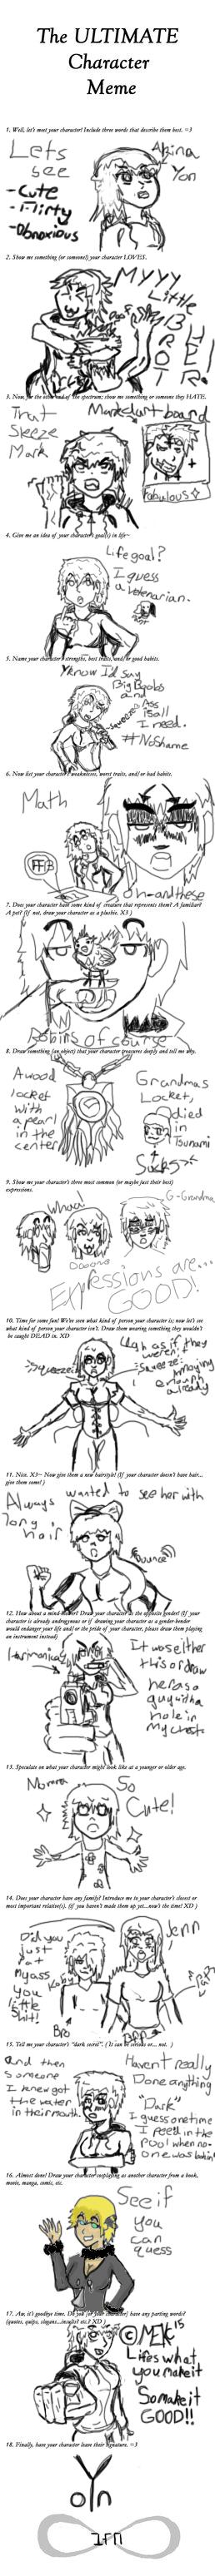 Ultimate Character Sheet (Akina Yon) by mekc95